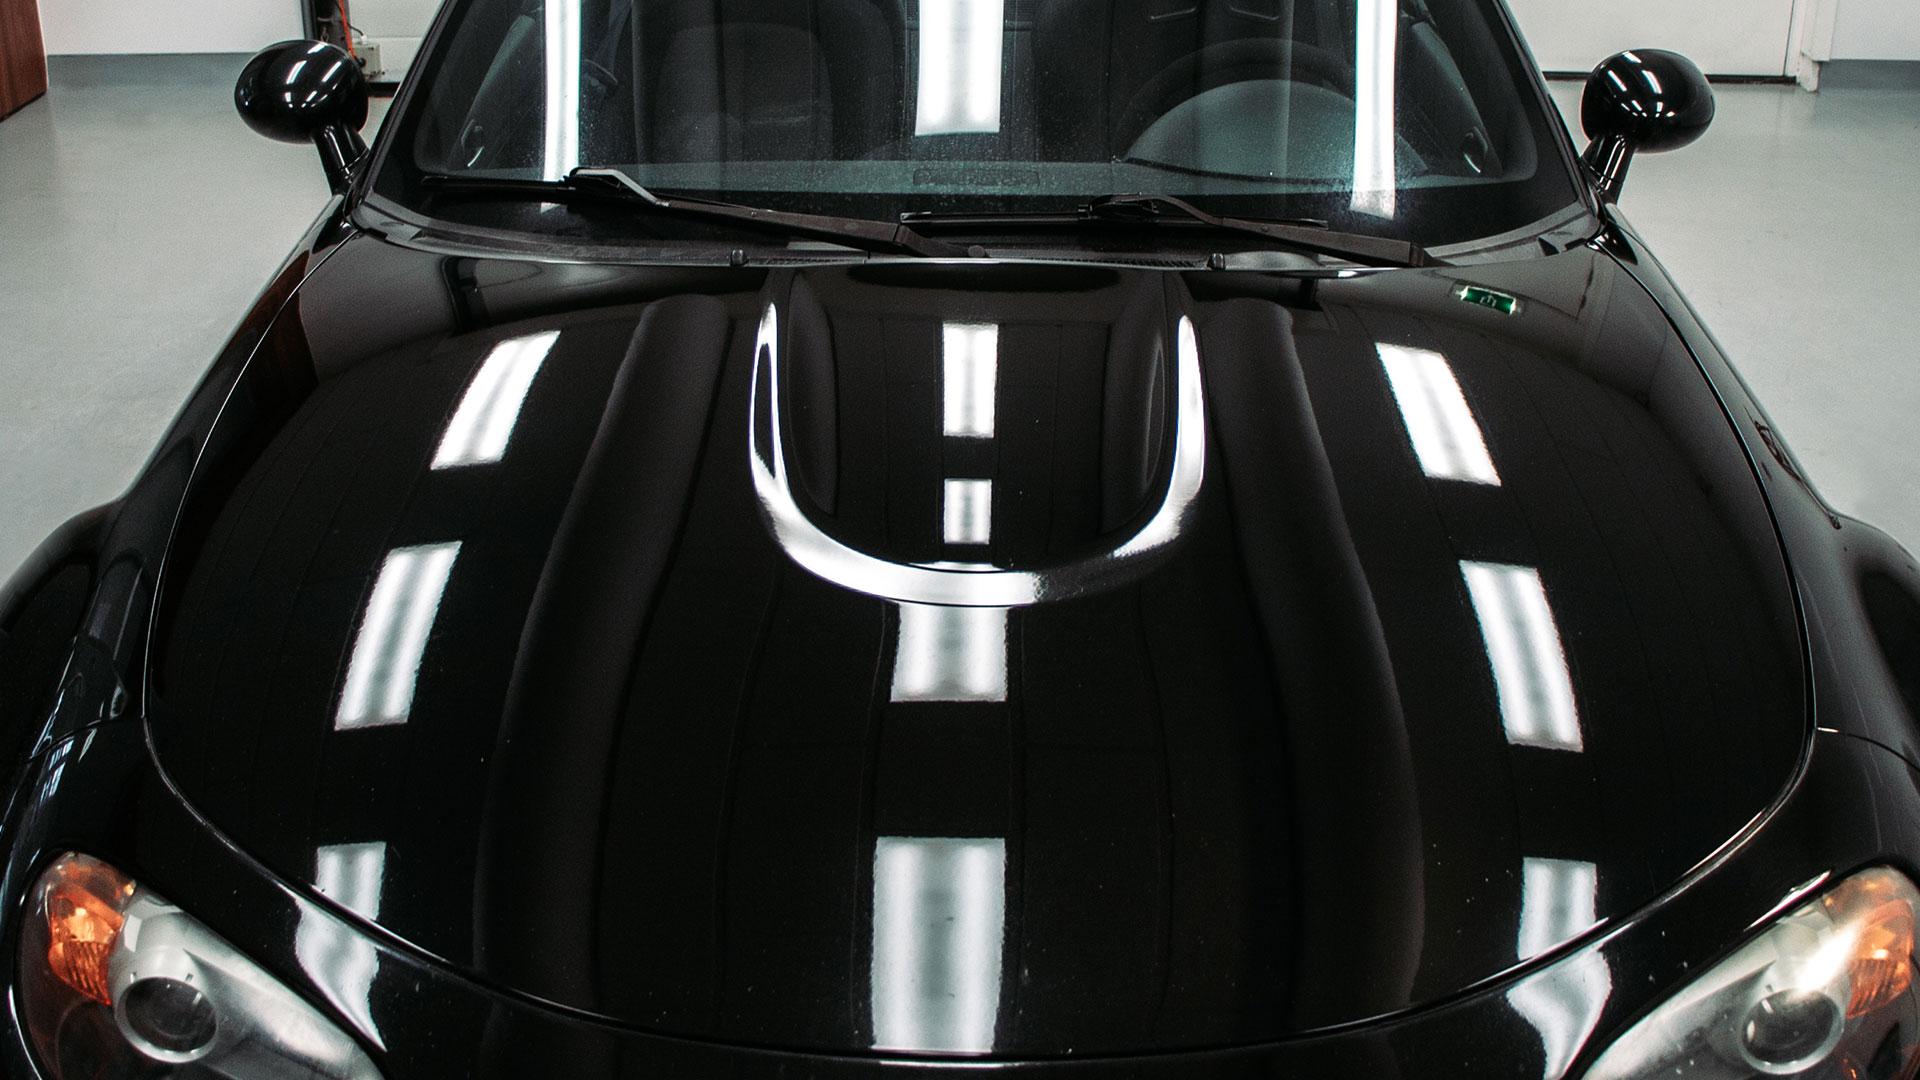 Gepolijste motorkap Mazda MX-5 NC omgekeerde powerdome